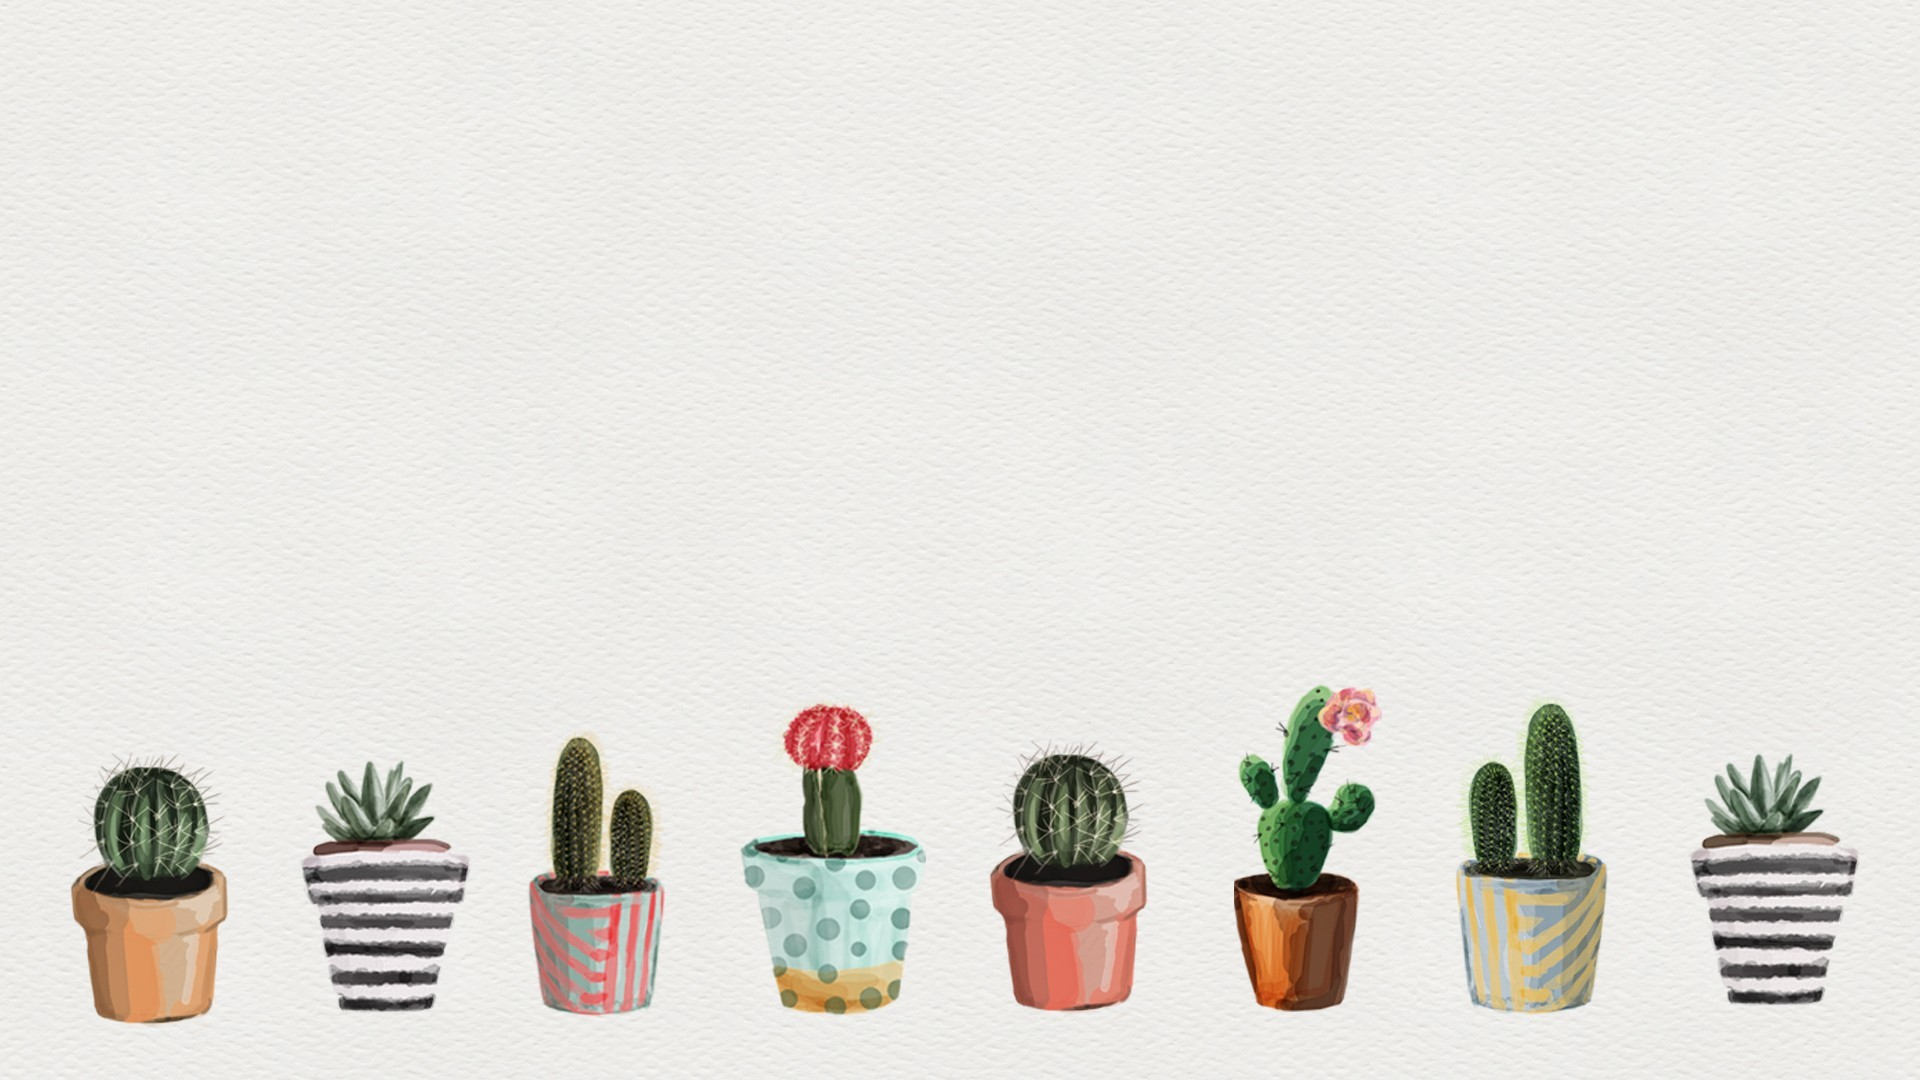 Cactus Wallpaper (52+ images)